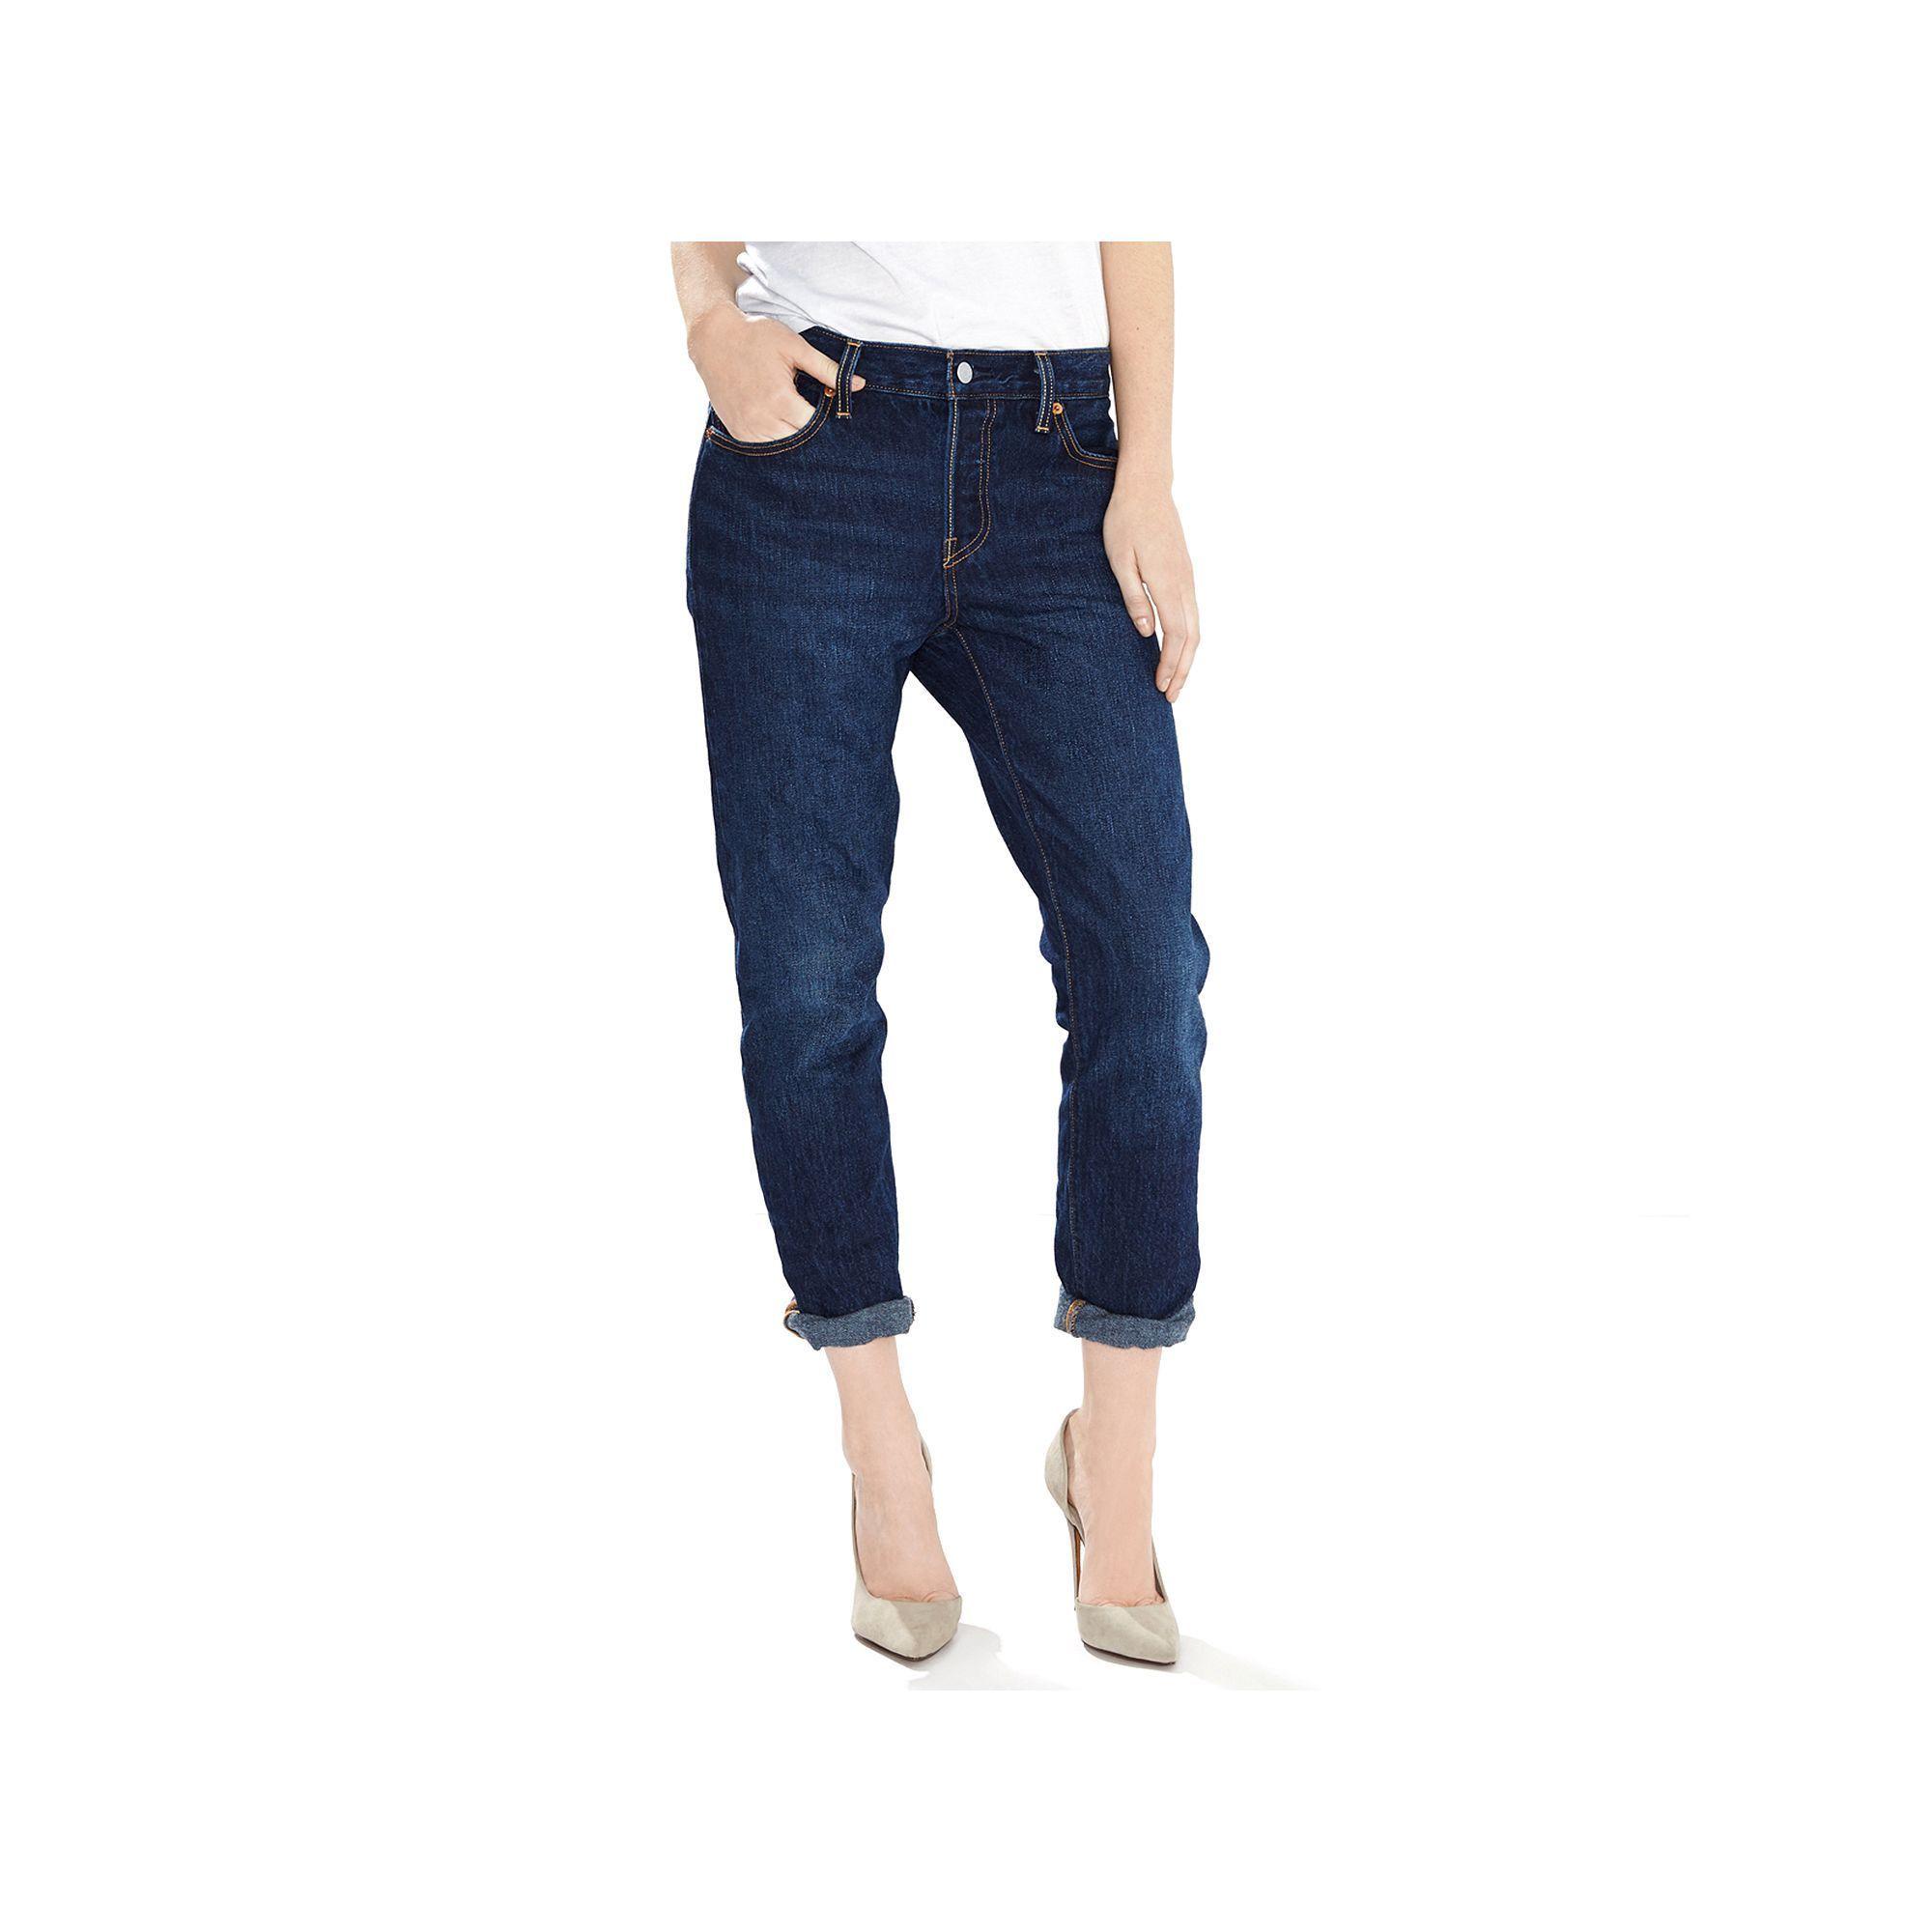 Levi's® 501® CT Boyfriend Jeans, Size: 00/24 Tall, Med Blue